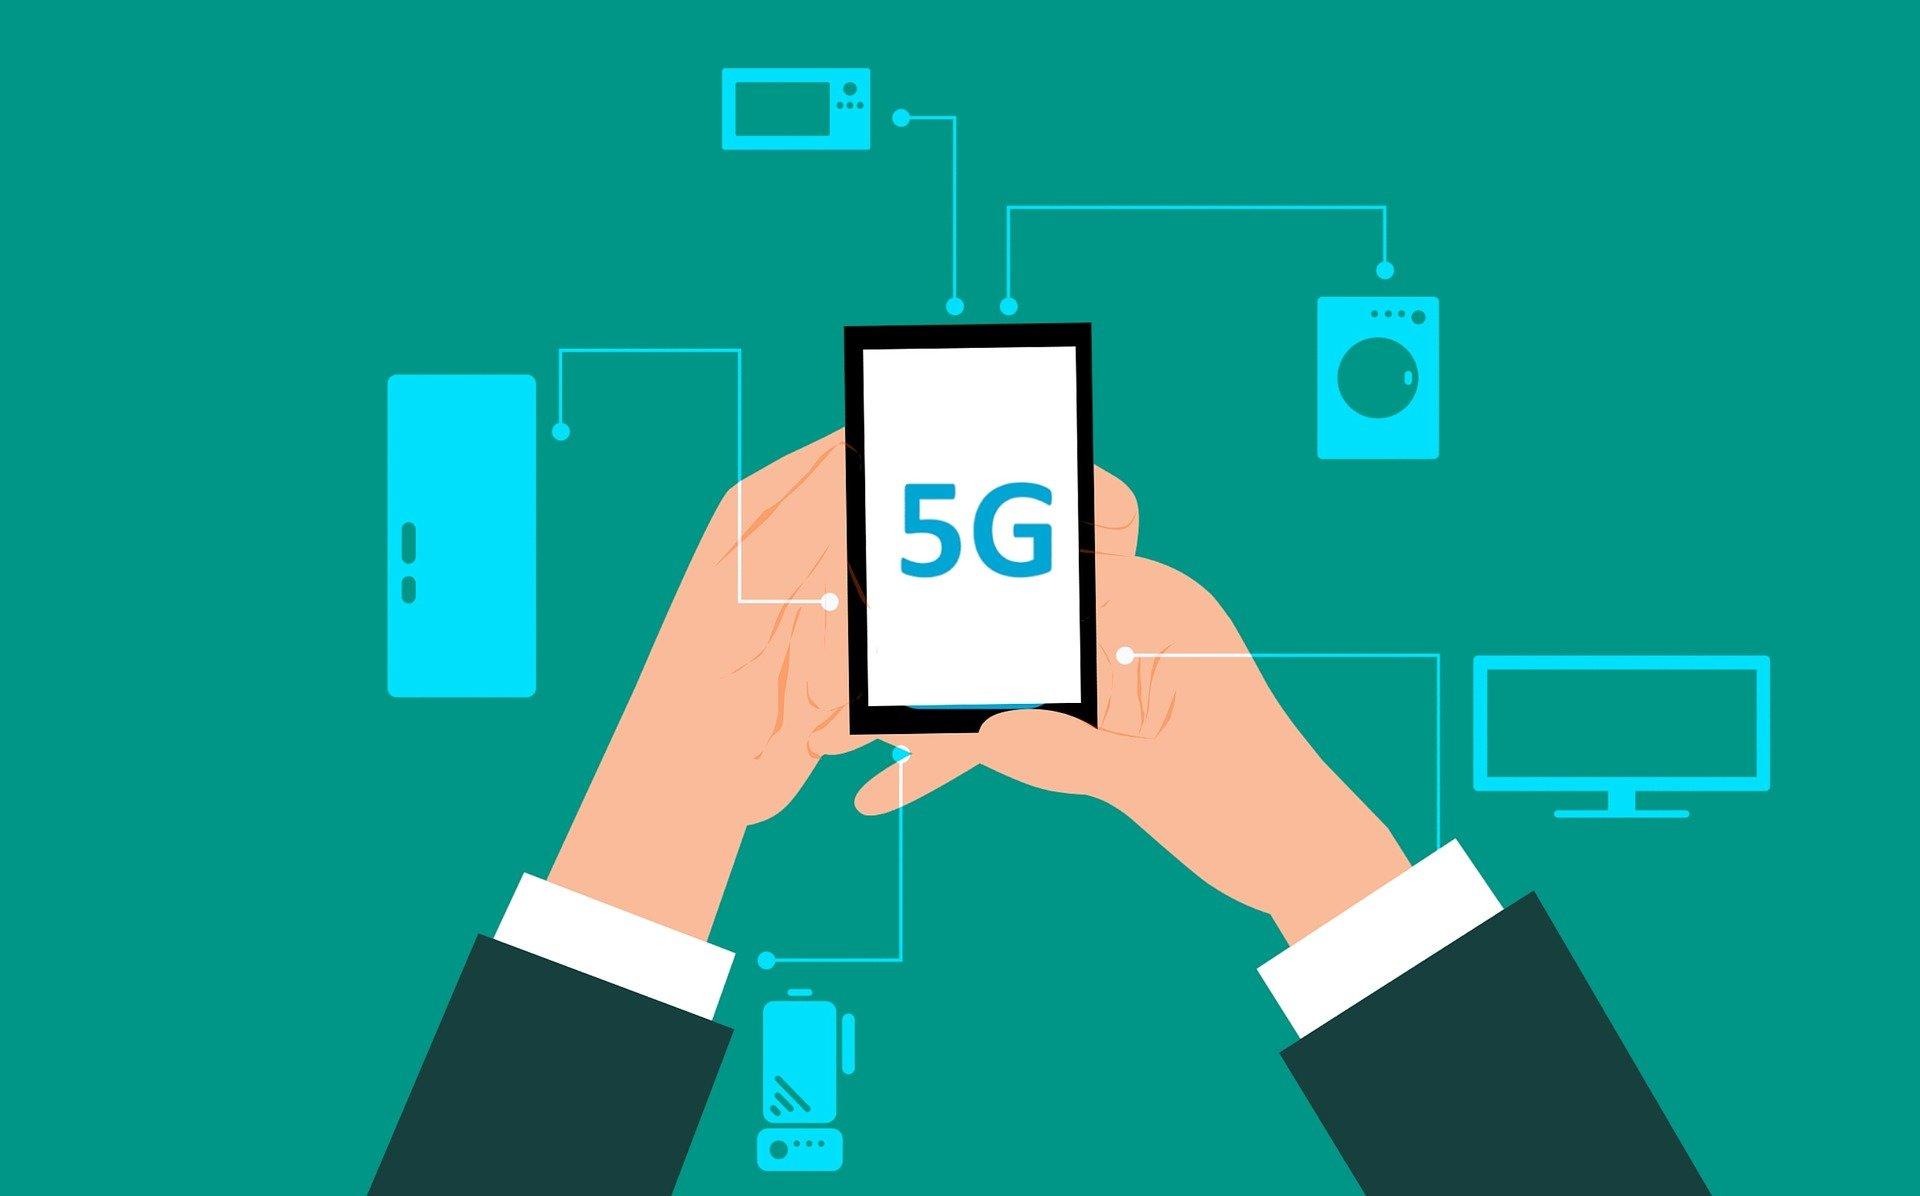 Intelligent Framework Aims to Optimize Data Transfer in 5g Networks